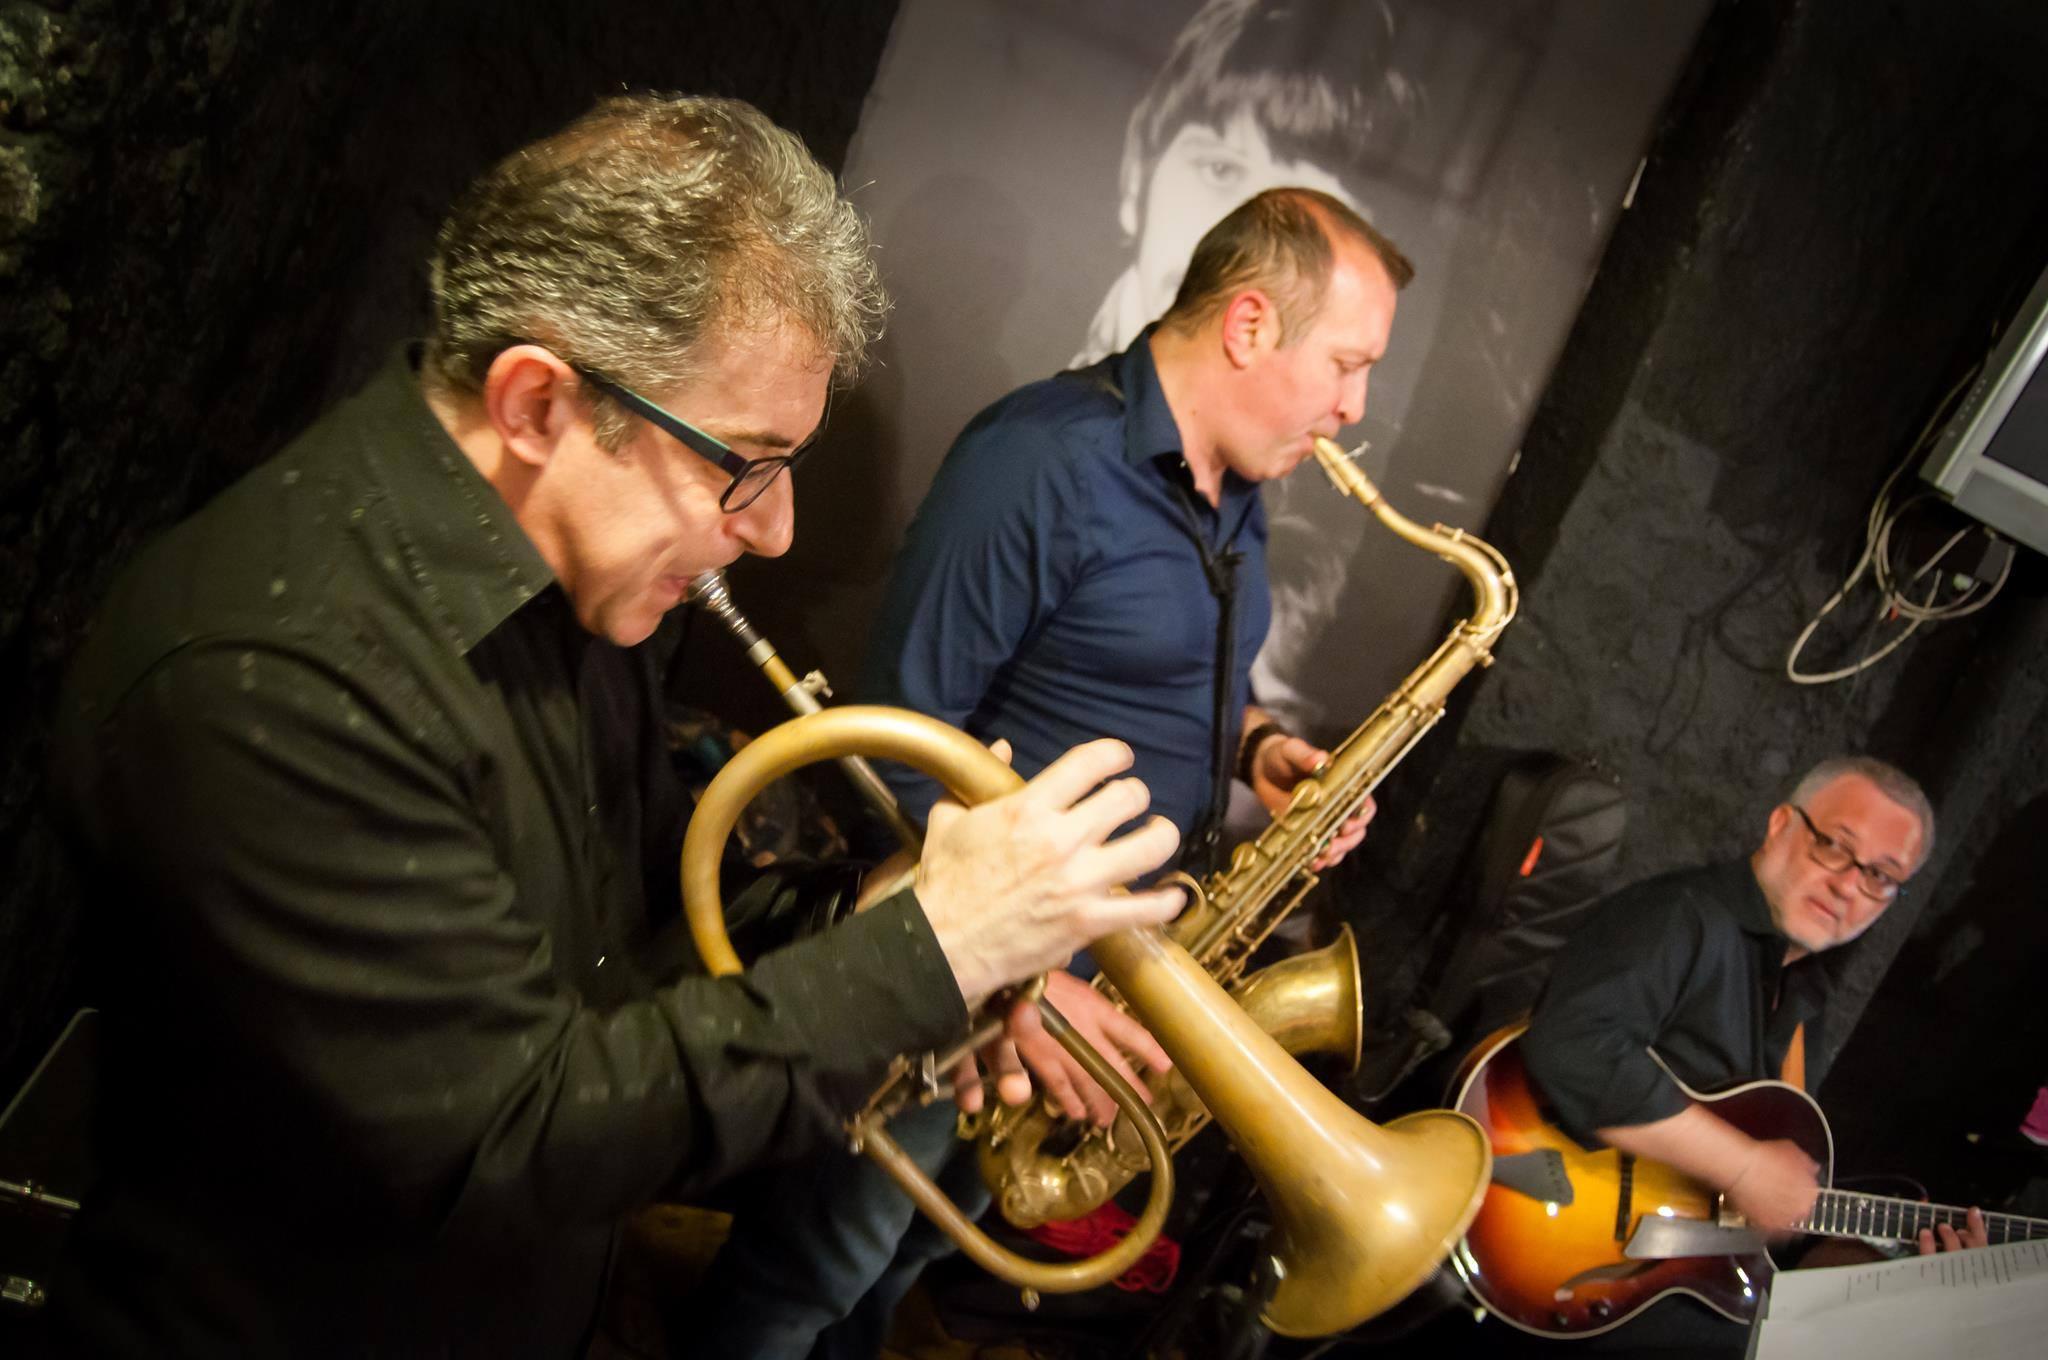 Il cool jazz dei Cetri!